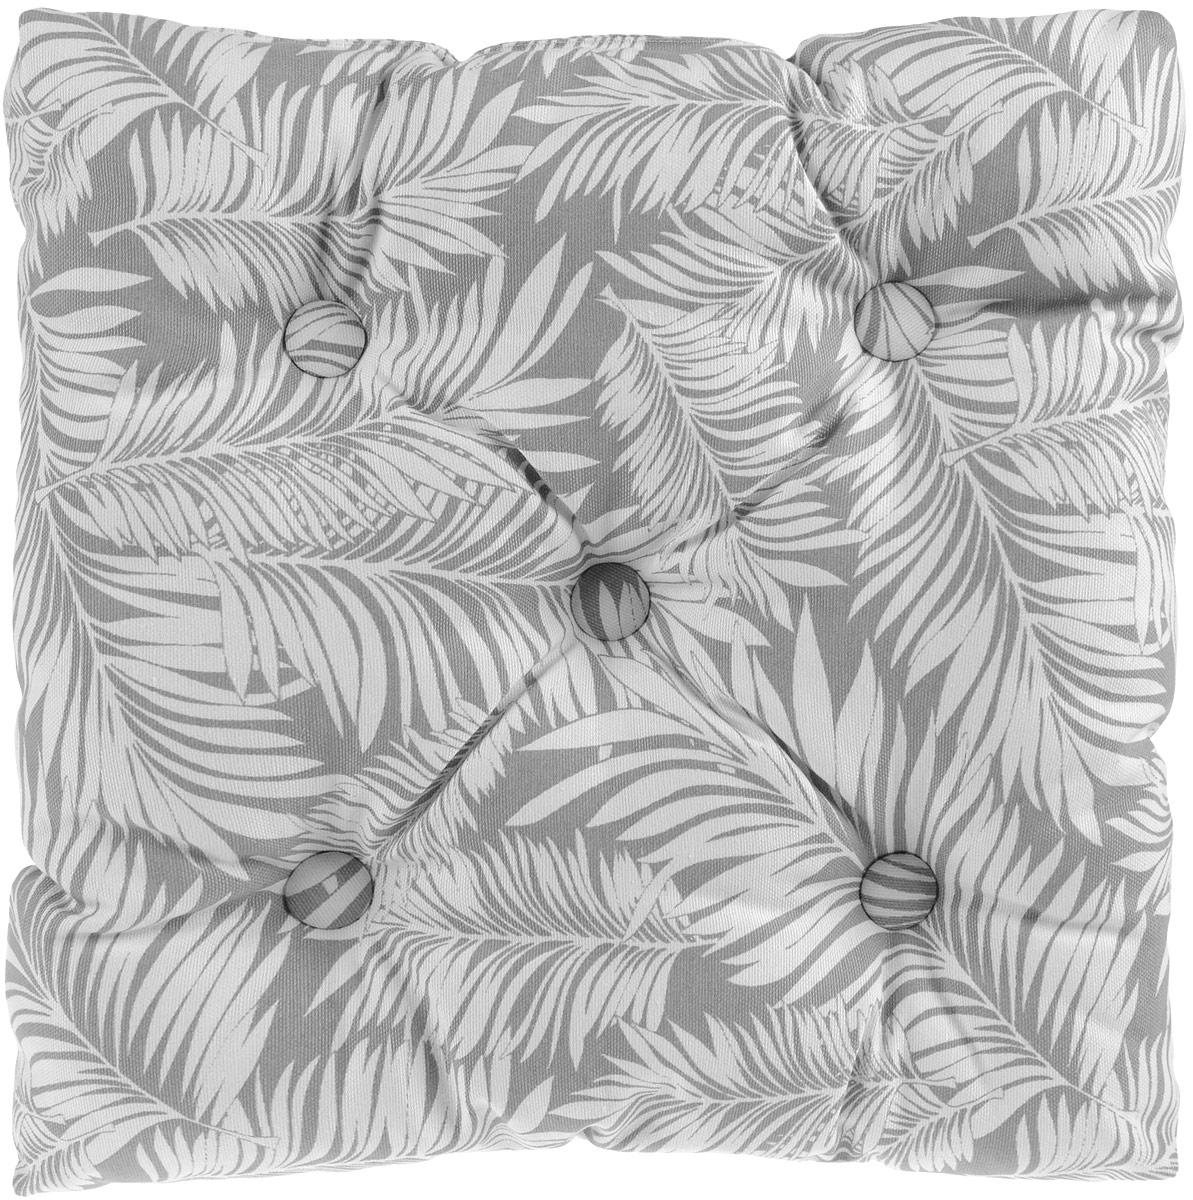 Подушка на стул KauffOrt Пальма, цвет: серый, 40 x 40 см подушка на стул kauffort barolo